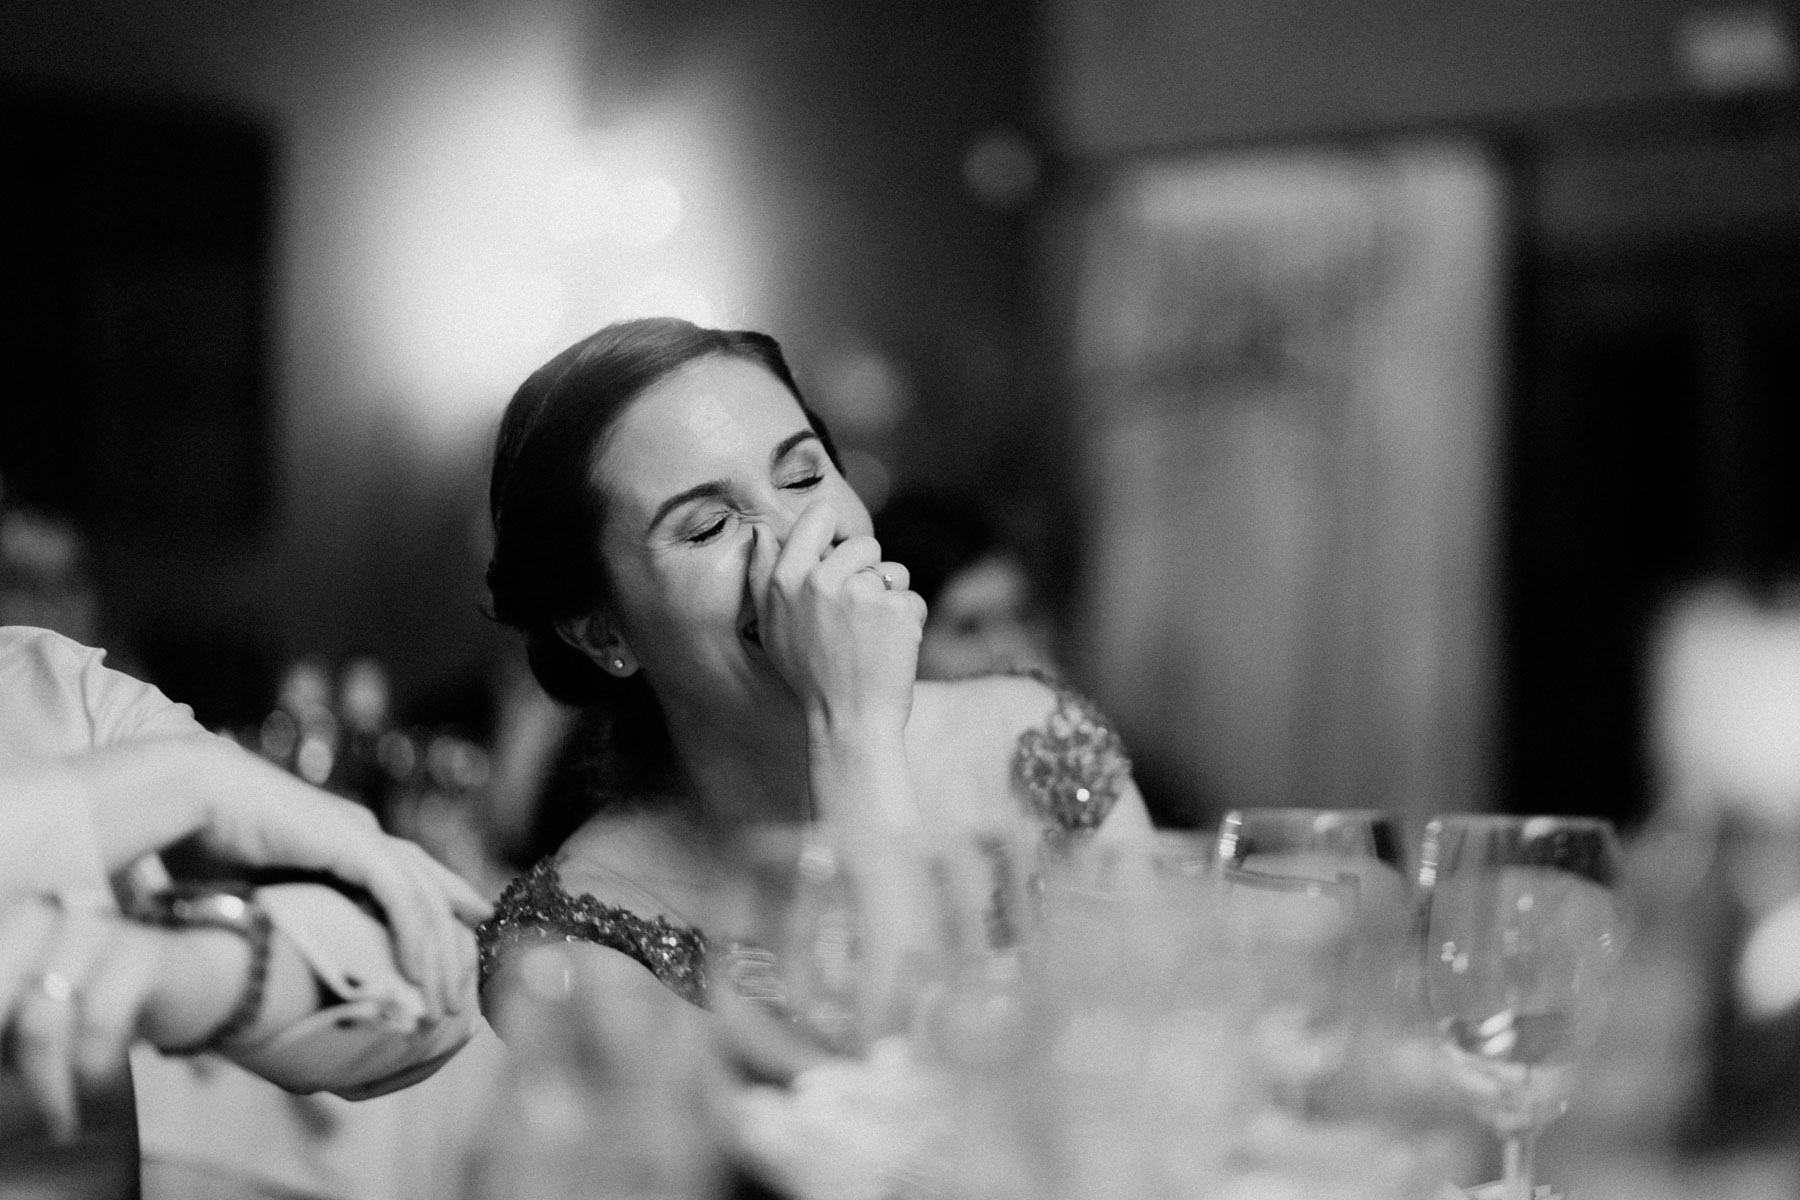 fotografo de bodas Jairo Crena-351